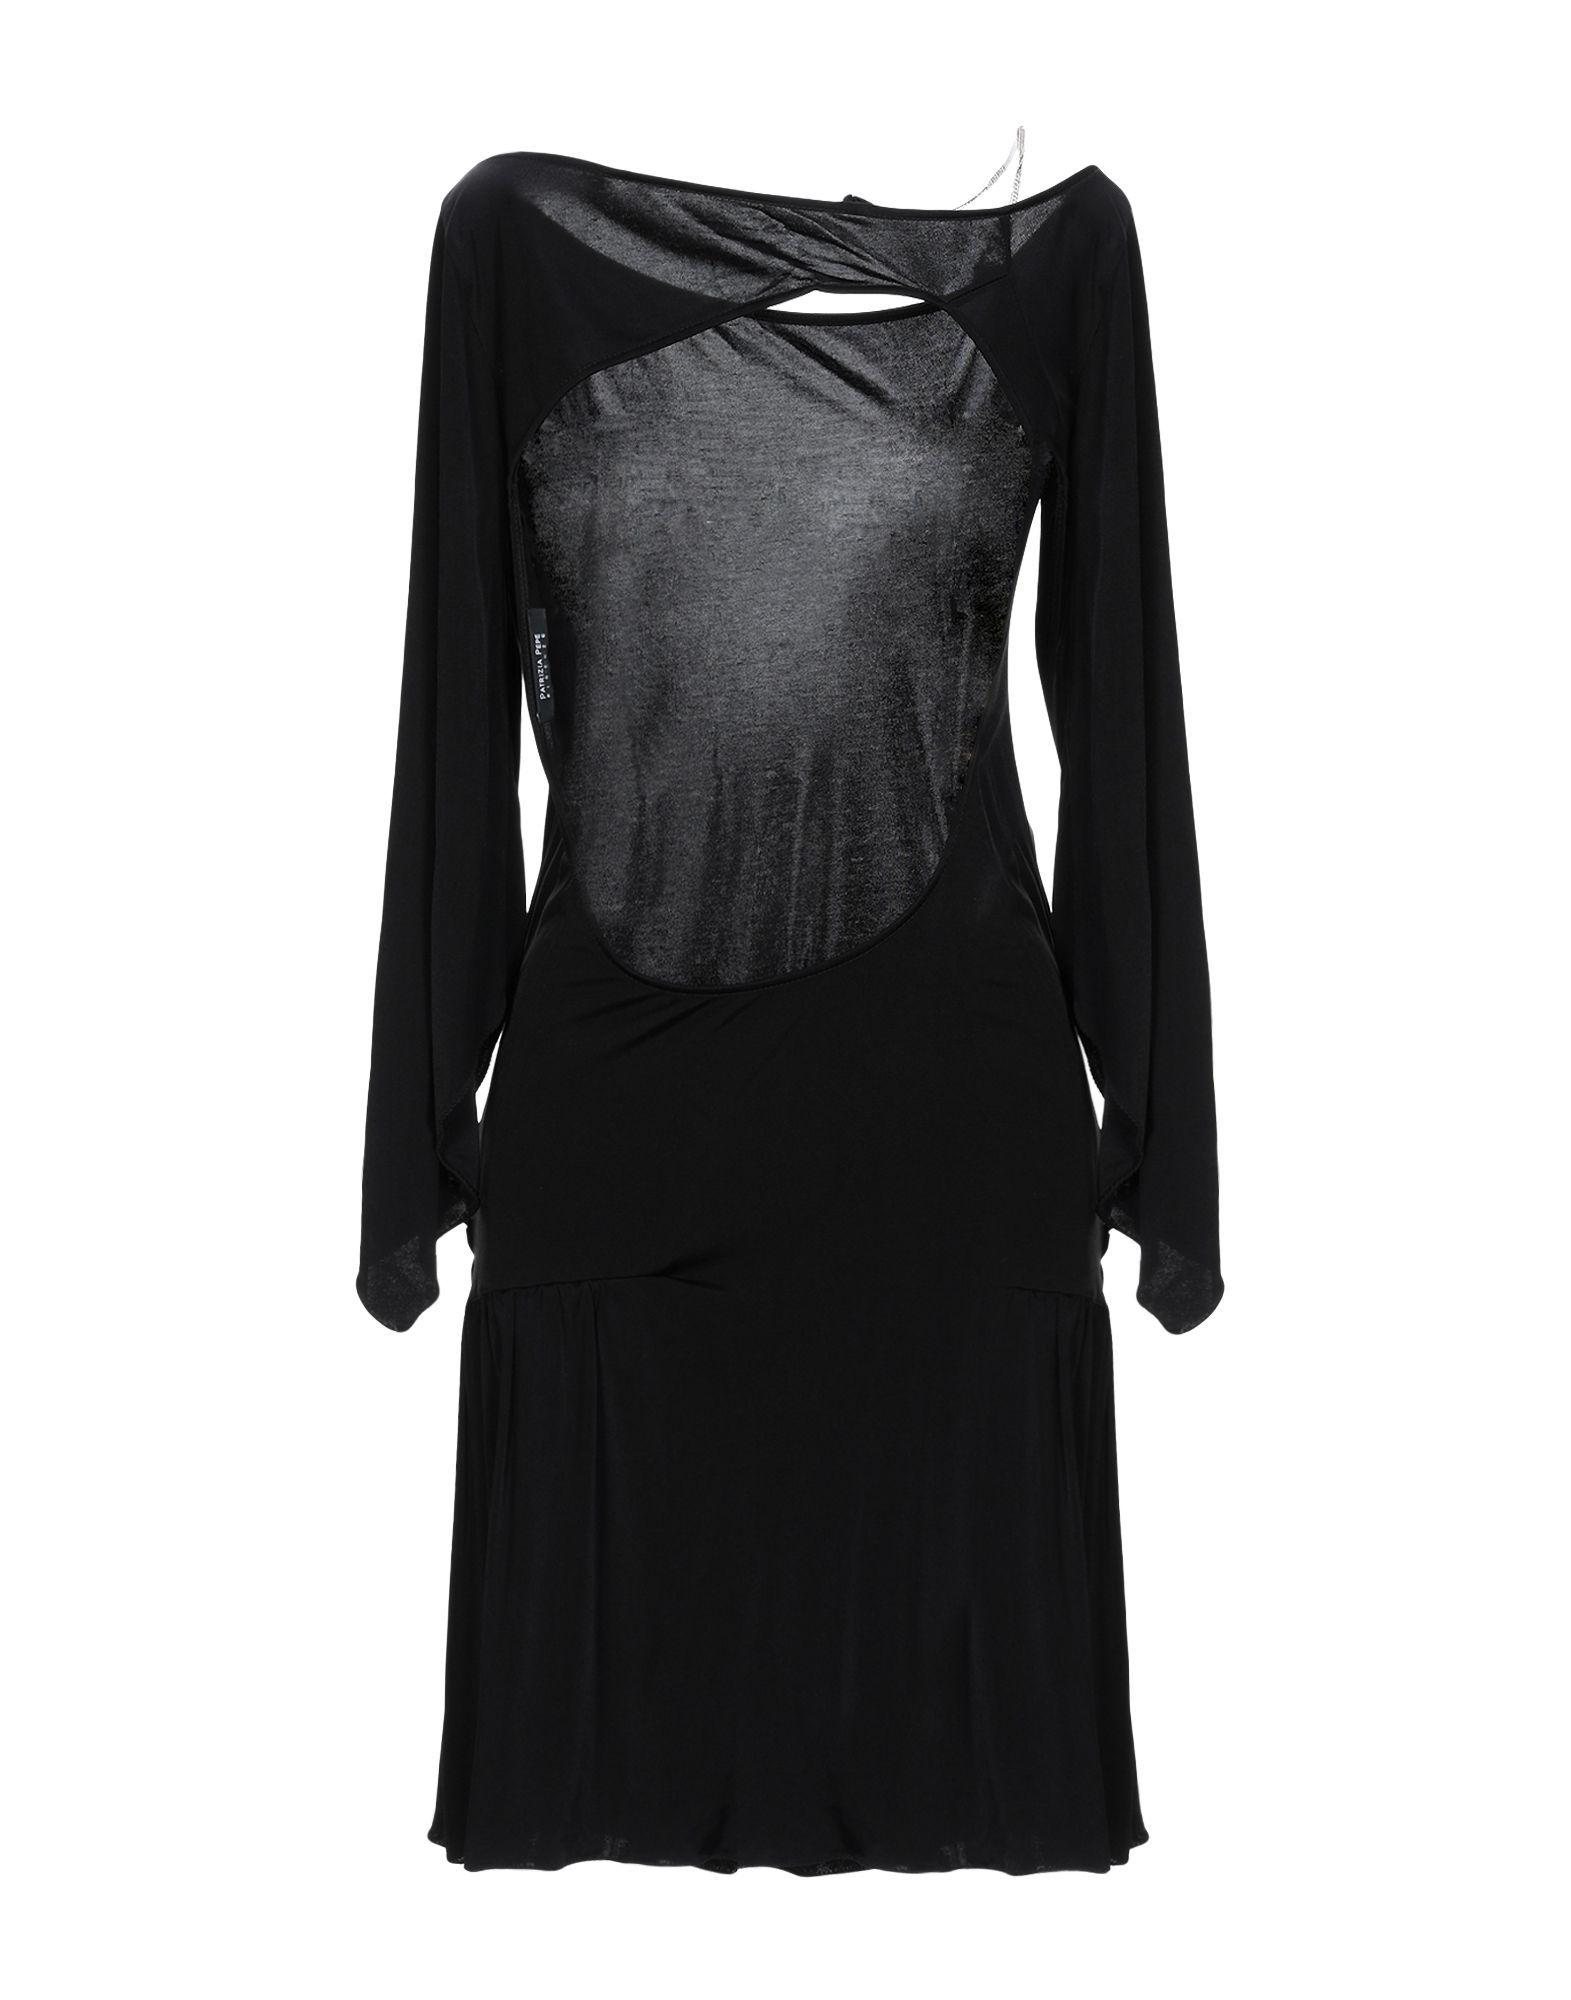 Patrizia Pepe Black Jersey Long Sleeve Dress